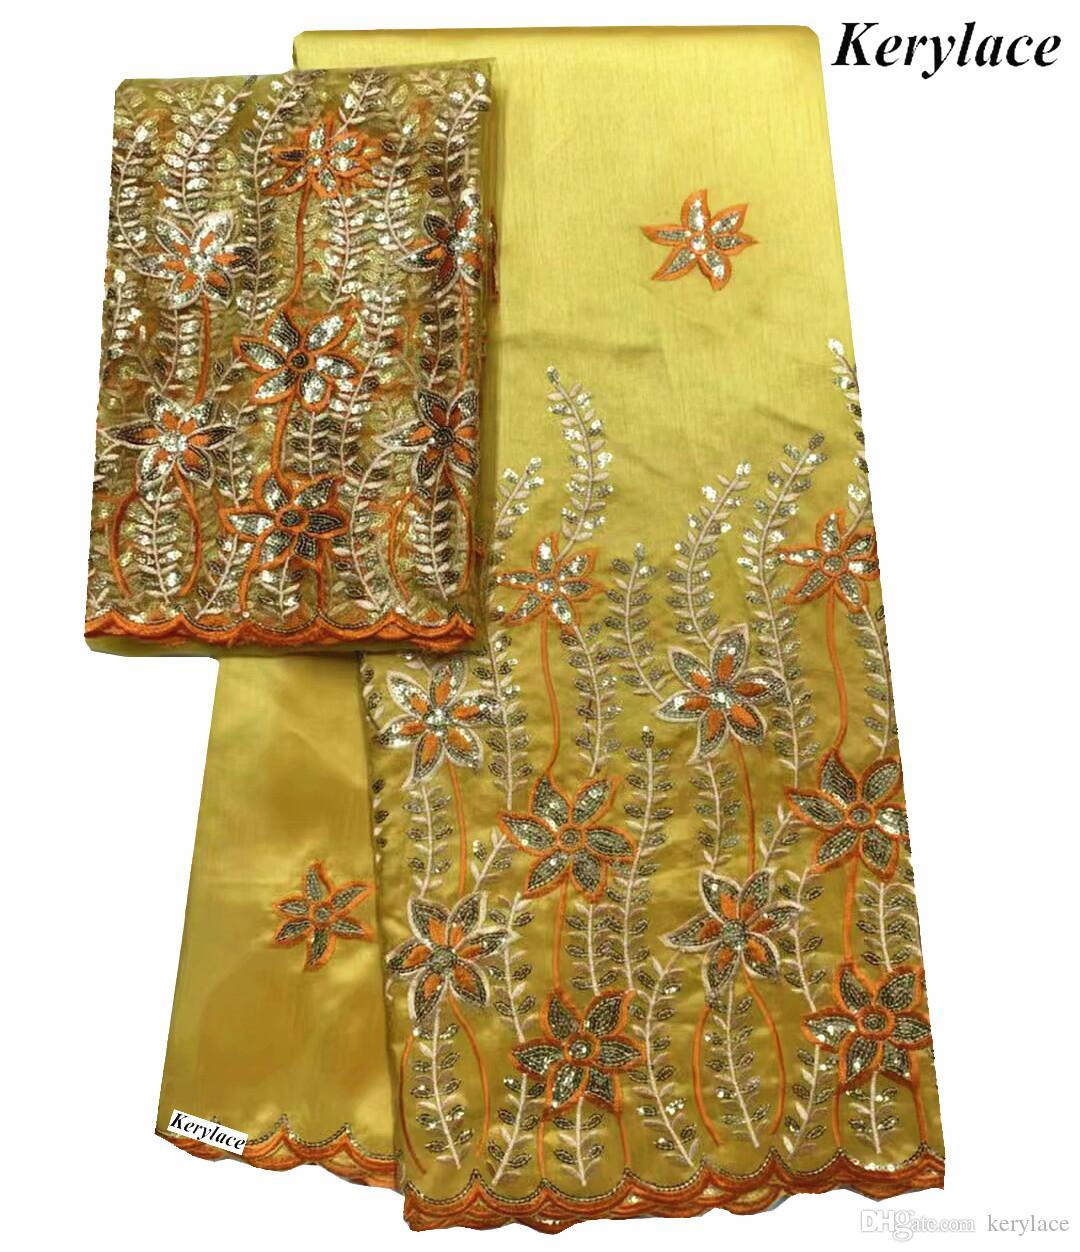 Multi Color Africano George Lace Tecido Com Lantejoula Lace nigeriano Wrapper alta qualidade Africano George tecido para o vestido KRL-92174